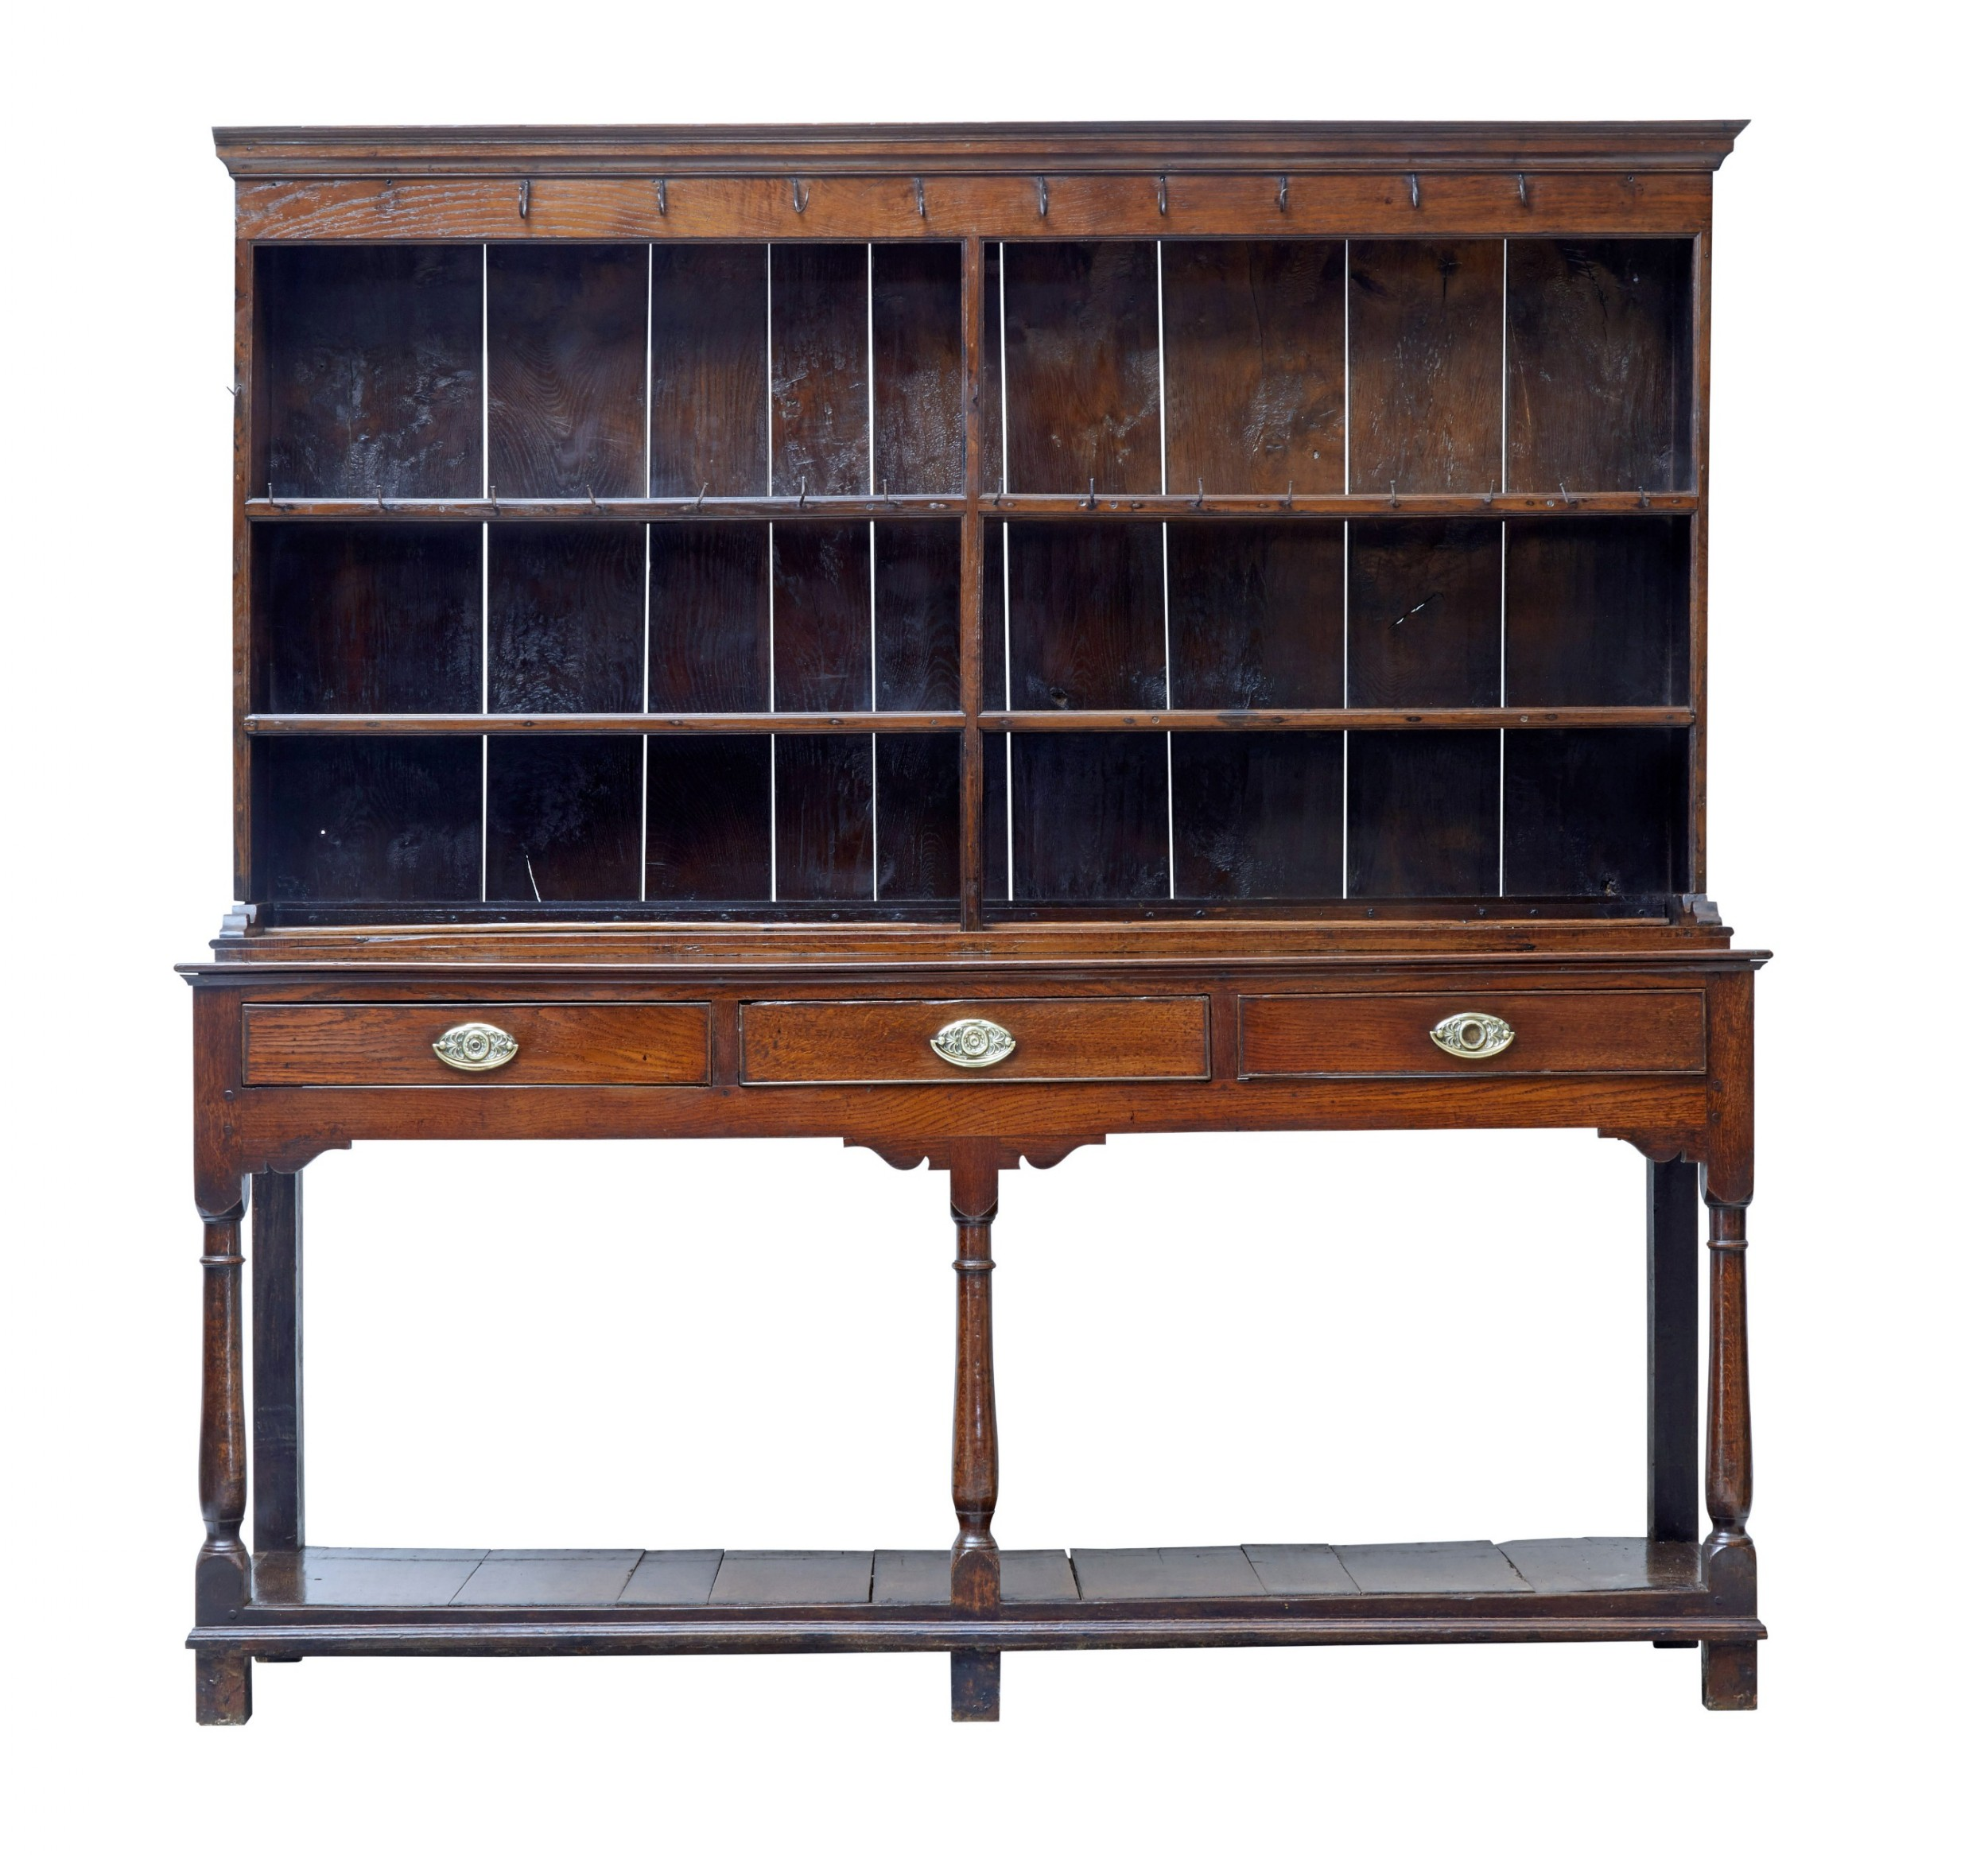 18th century welsh oak dresser and rack